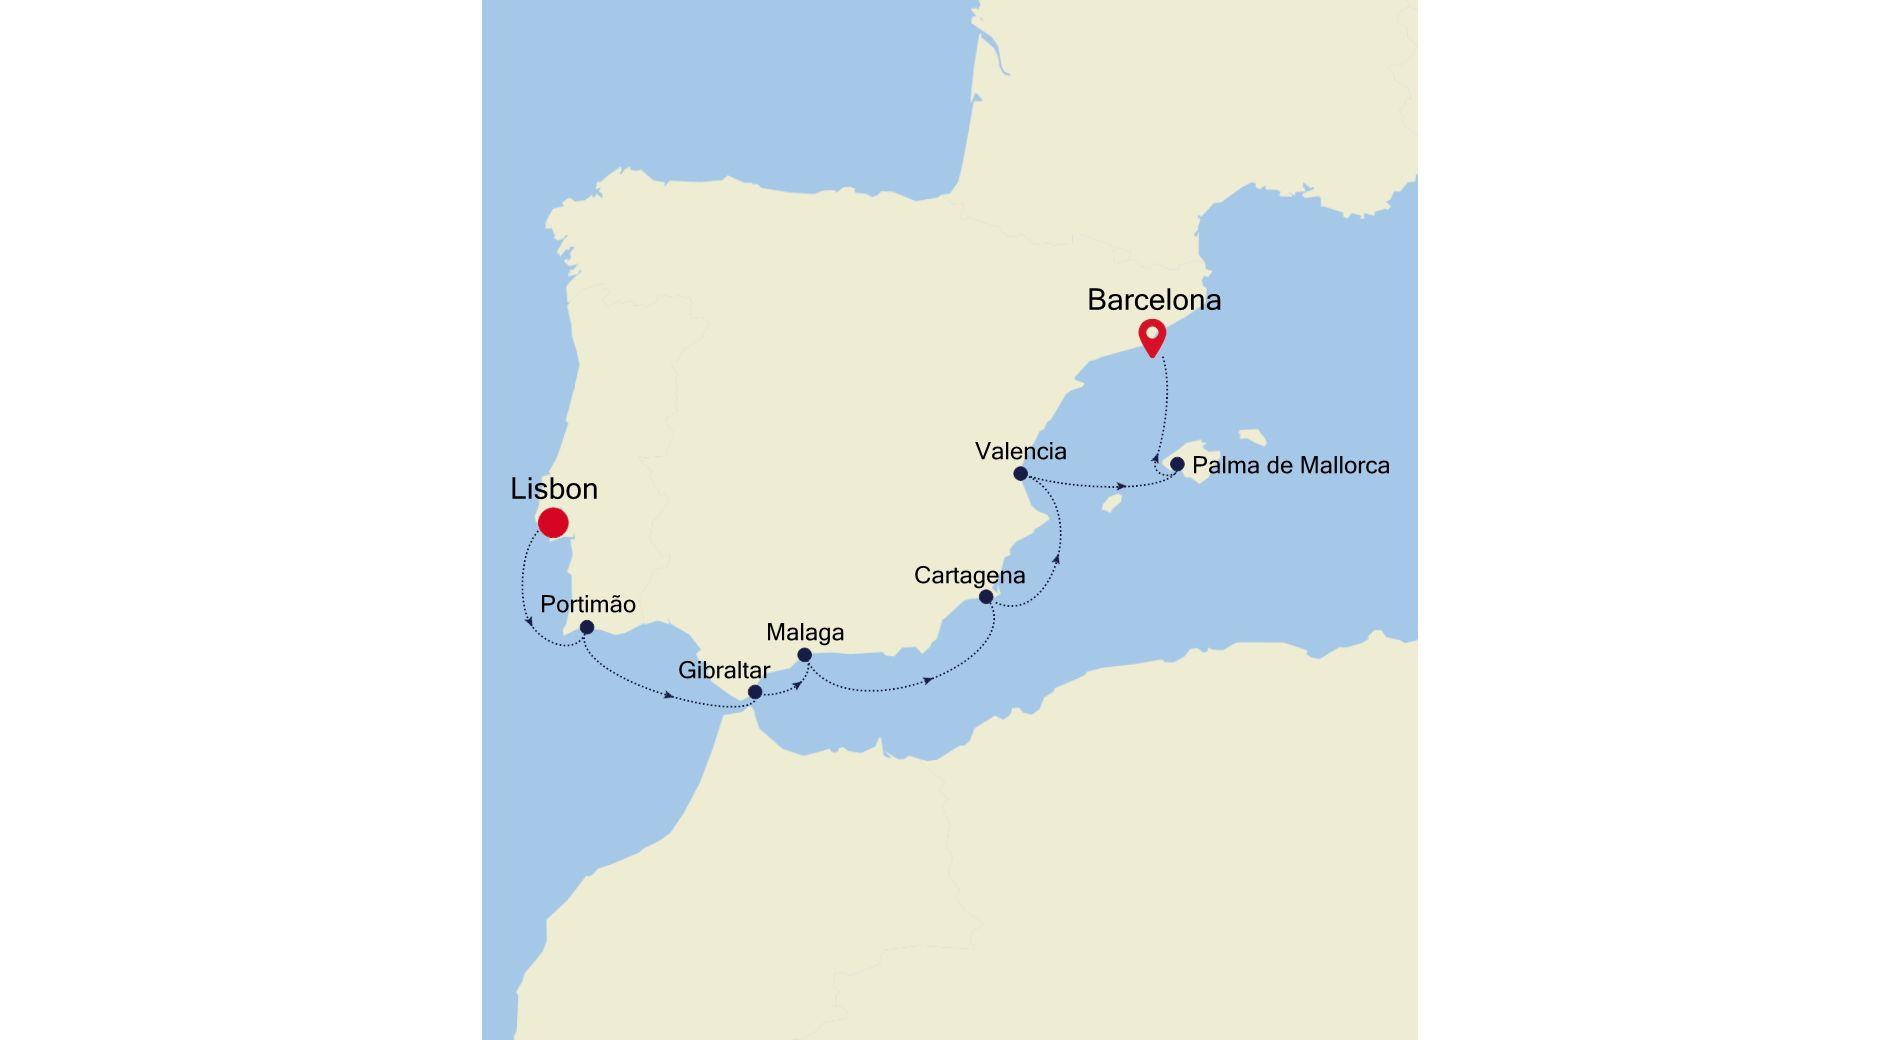 MO200903009 - Lisbon to Barcelona